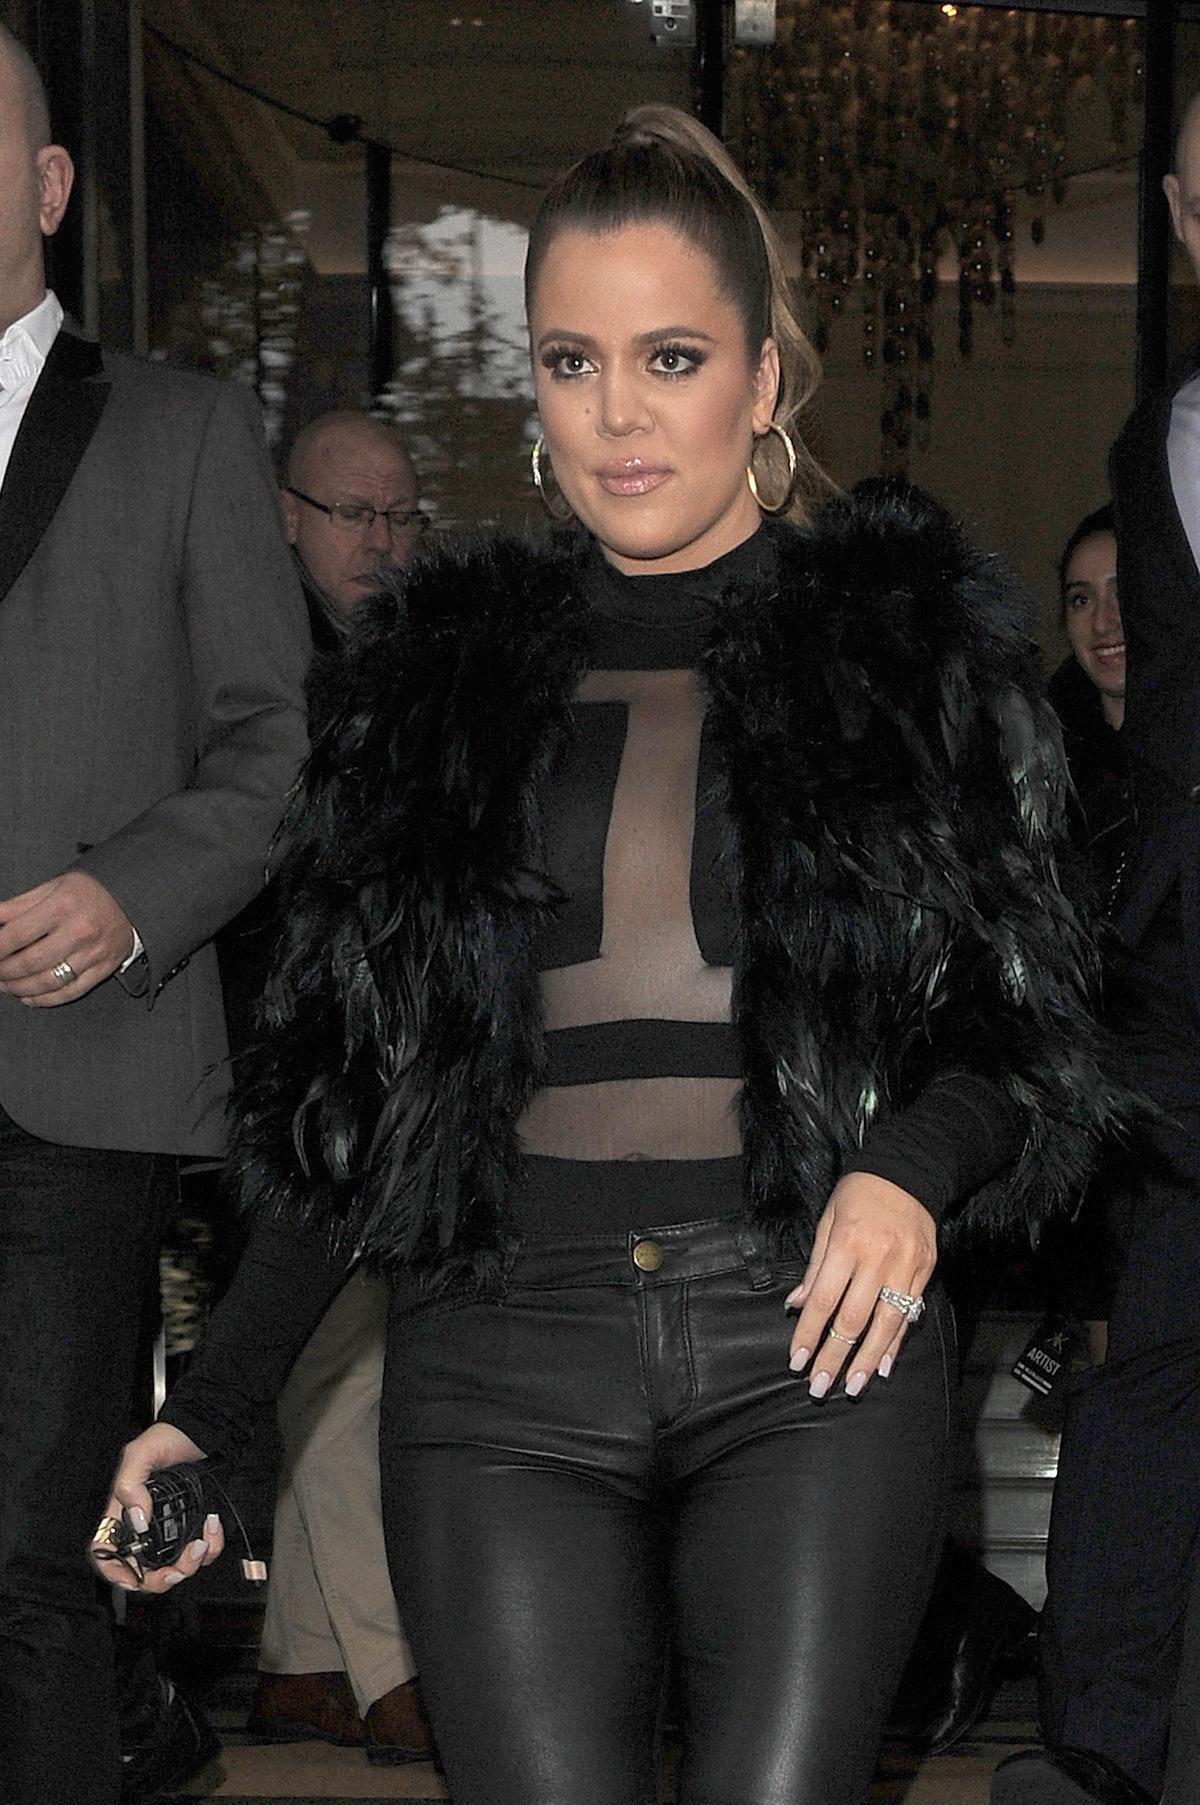 Khloe Kardashian steps out in a fur jacket.